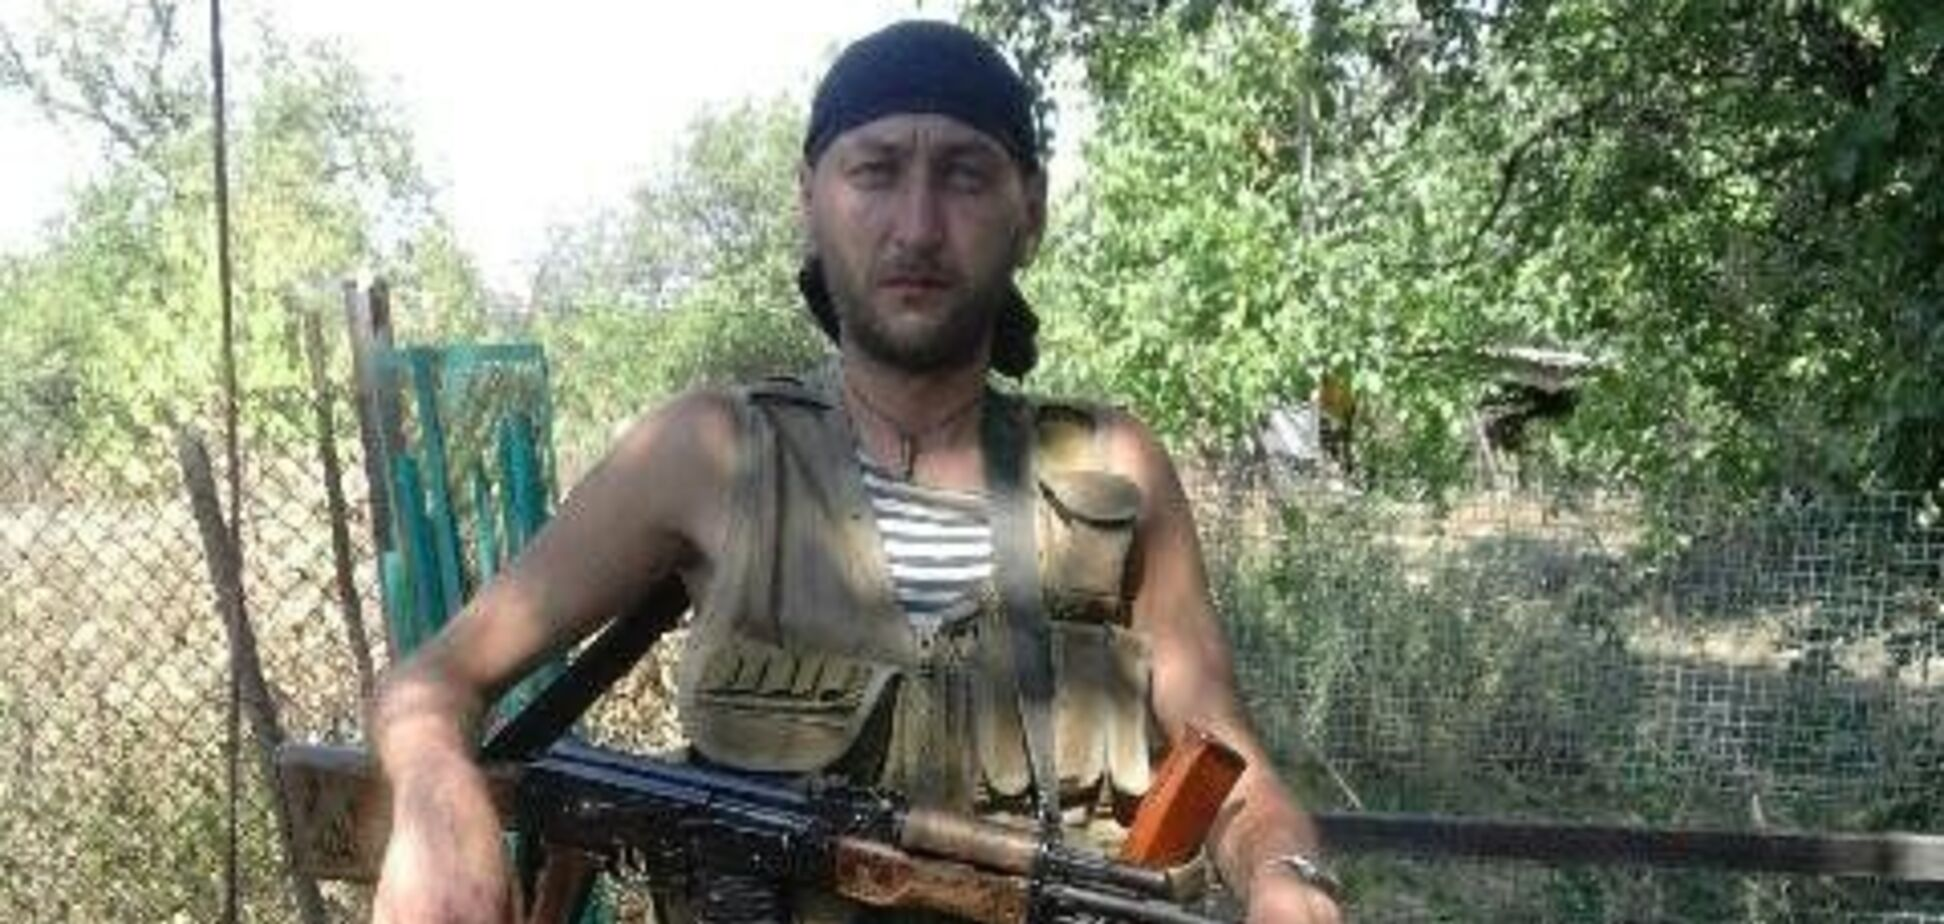 На Донбасі вбили небезпечного терориста 'Батю'. Фото